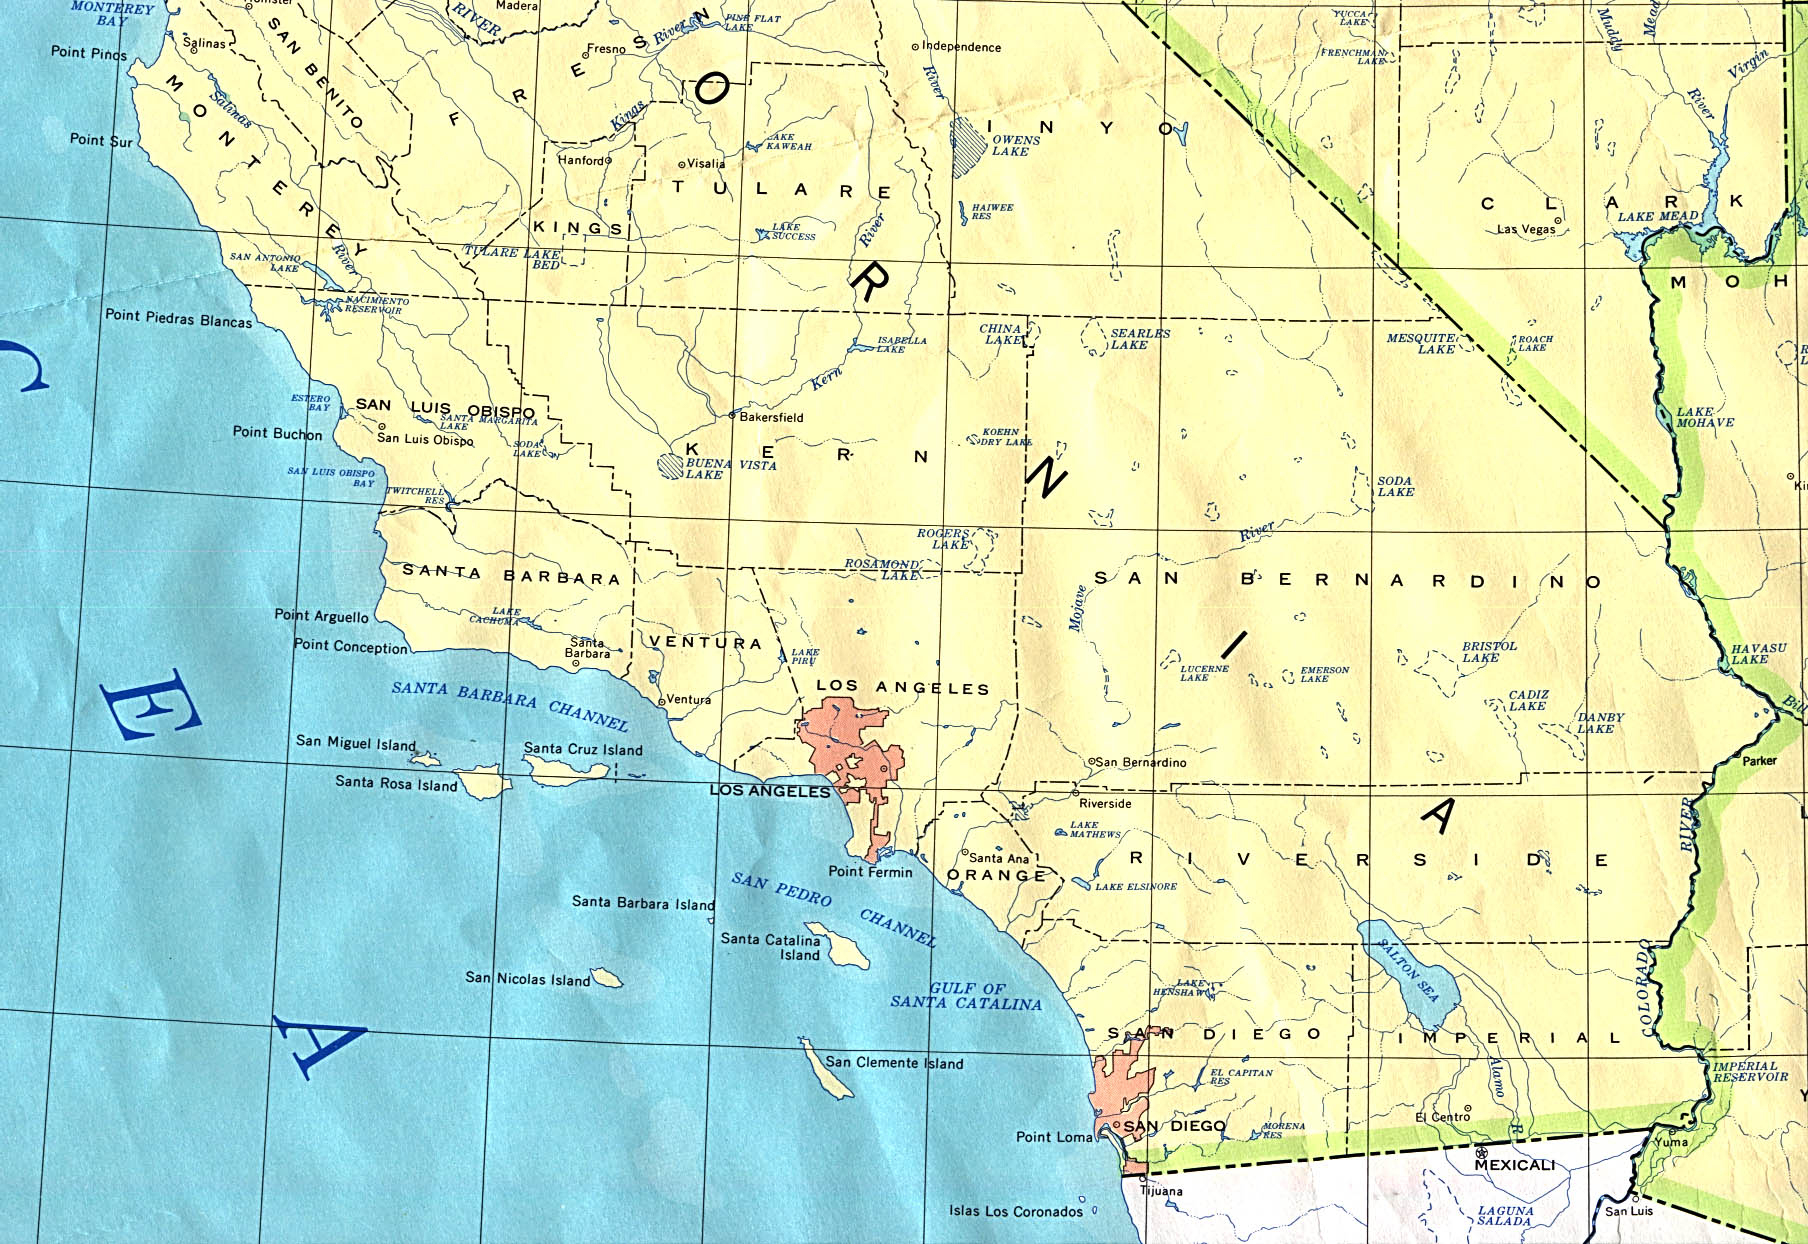 California California Road Map Google Map Southern California - California Road Map Google